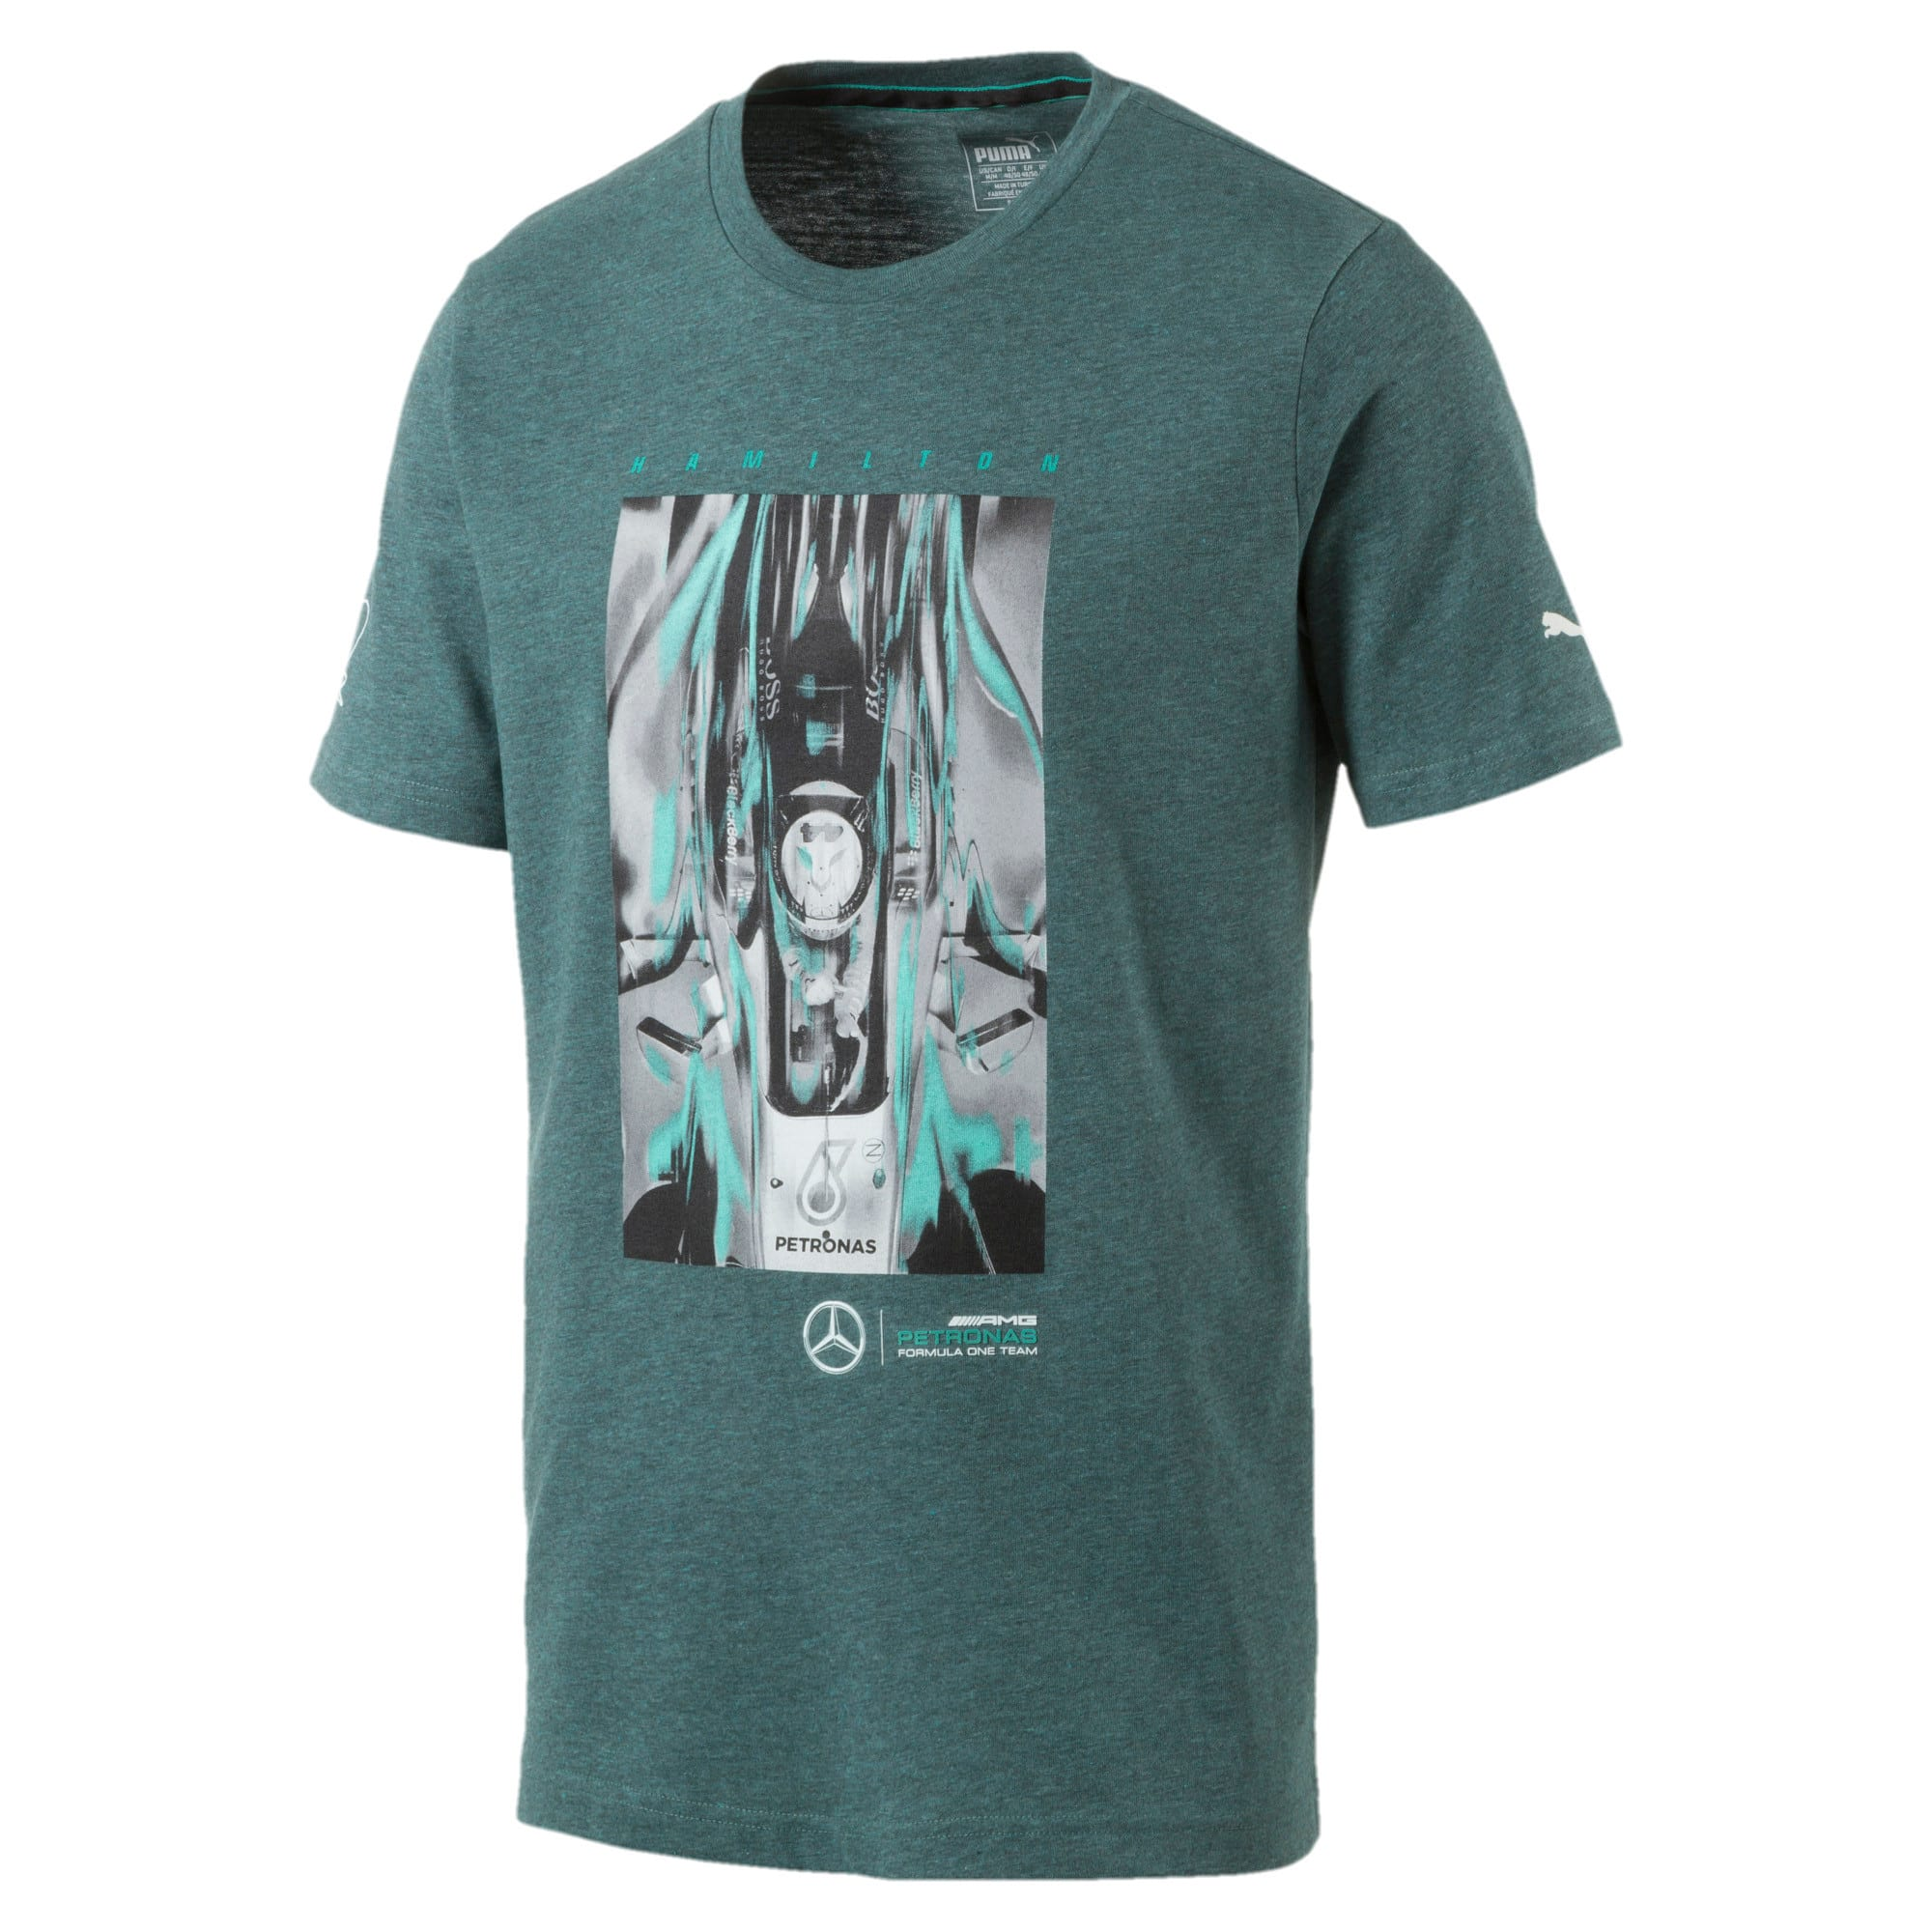 Thumbnail 2 of MERCEDES AMG PETRONAS Men's Driver T-Shirt, Deep Teal Heather, medium-IND